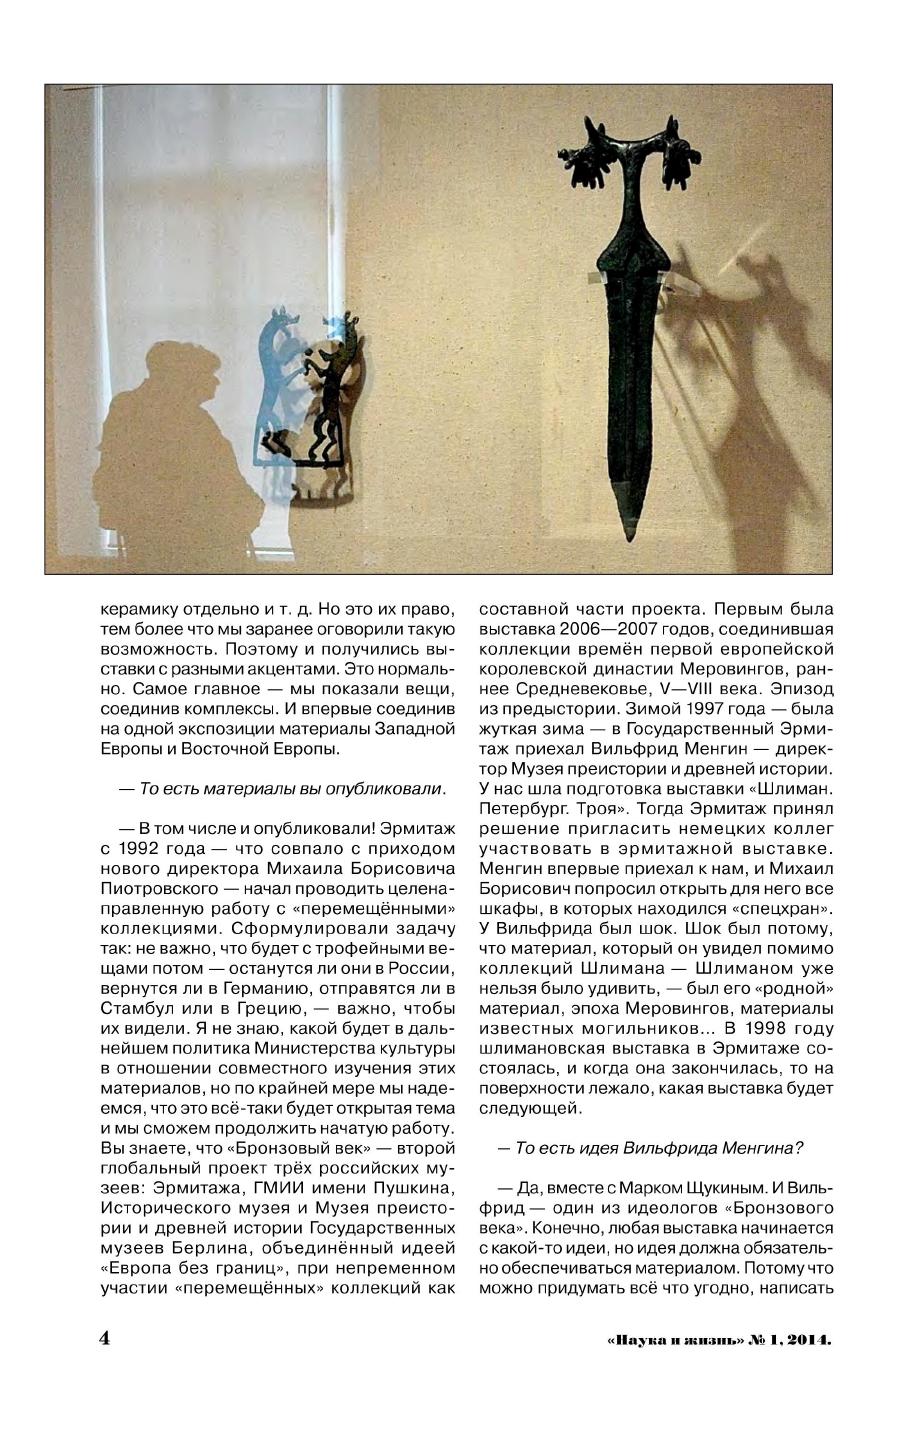 http://i6.imageban.ru/out/2014/01/12/1f2b71ec127baad010b2dd3bf032a621.jpg